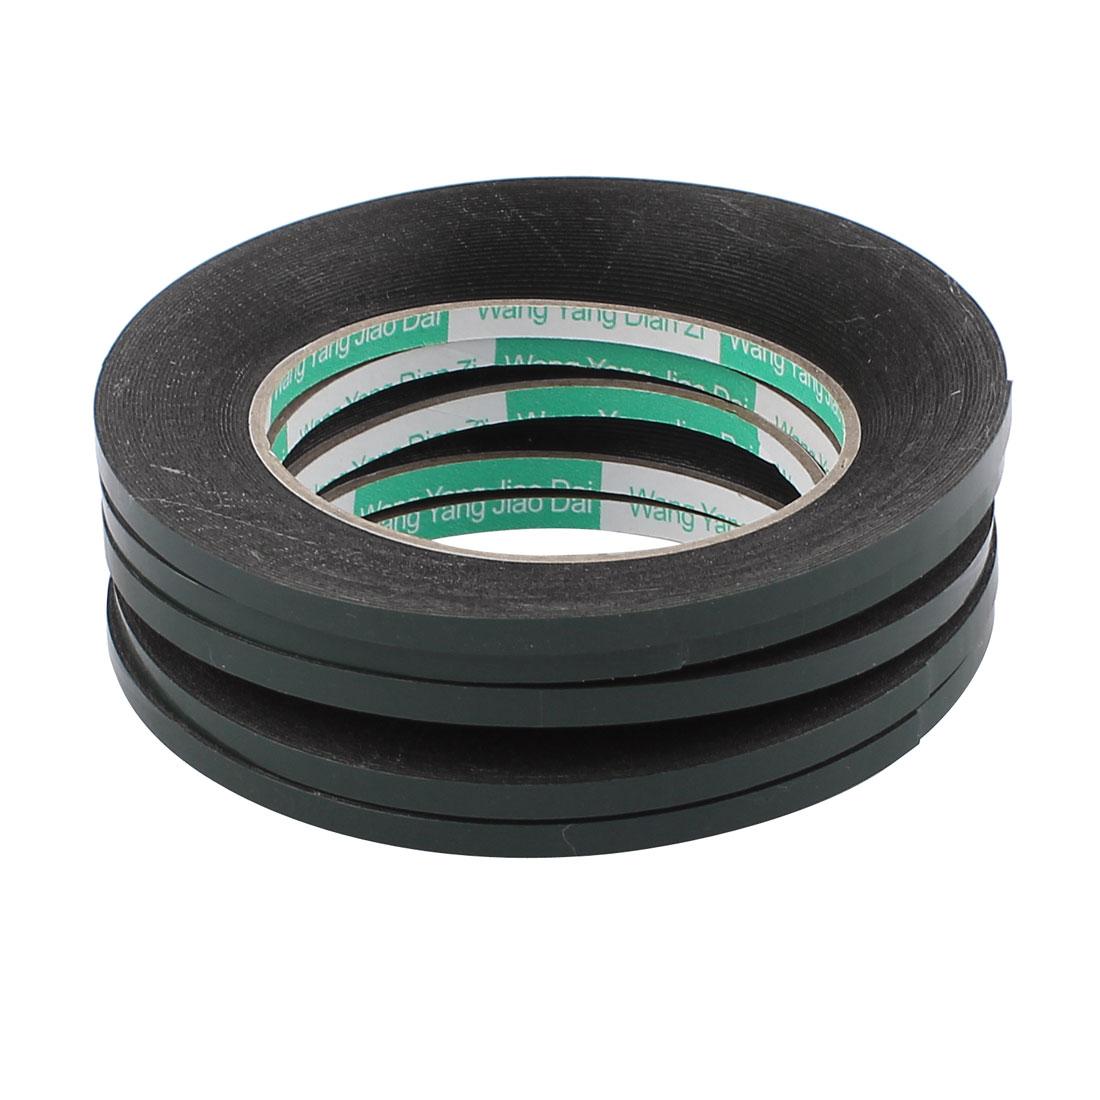 5 Pcs 0.5CM Width 10M Length 0.5MM Thick Dual Sided Sealing Shockproof Sponge Tape